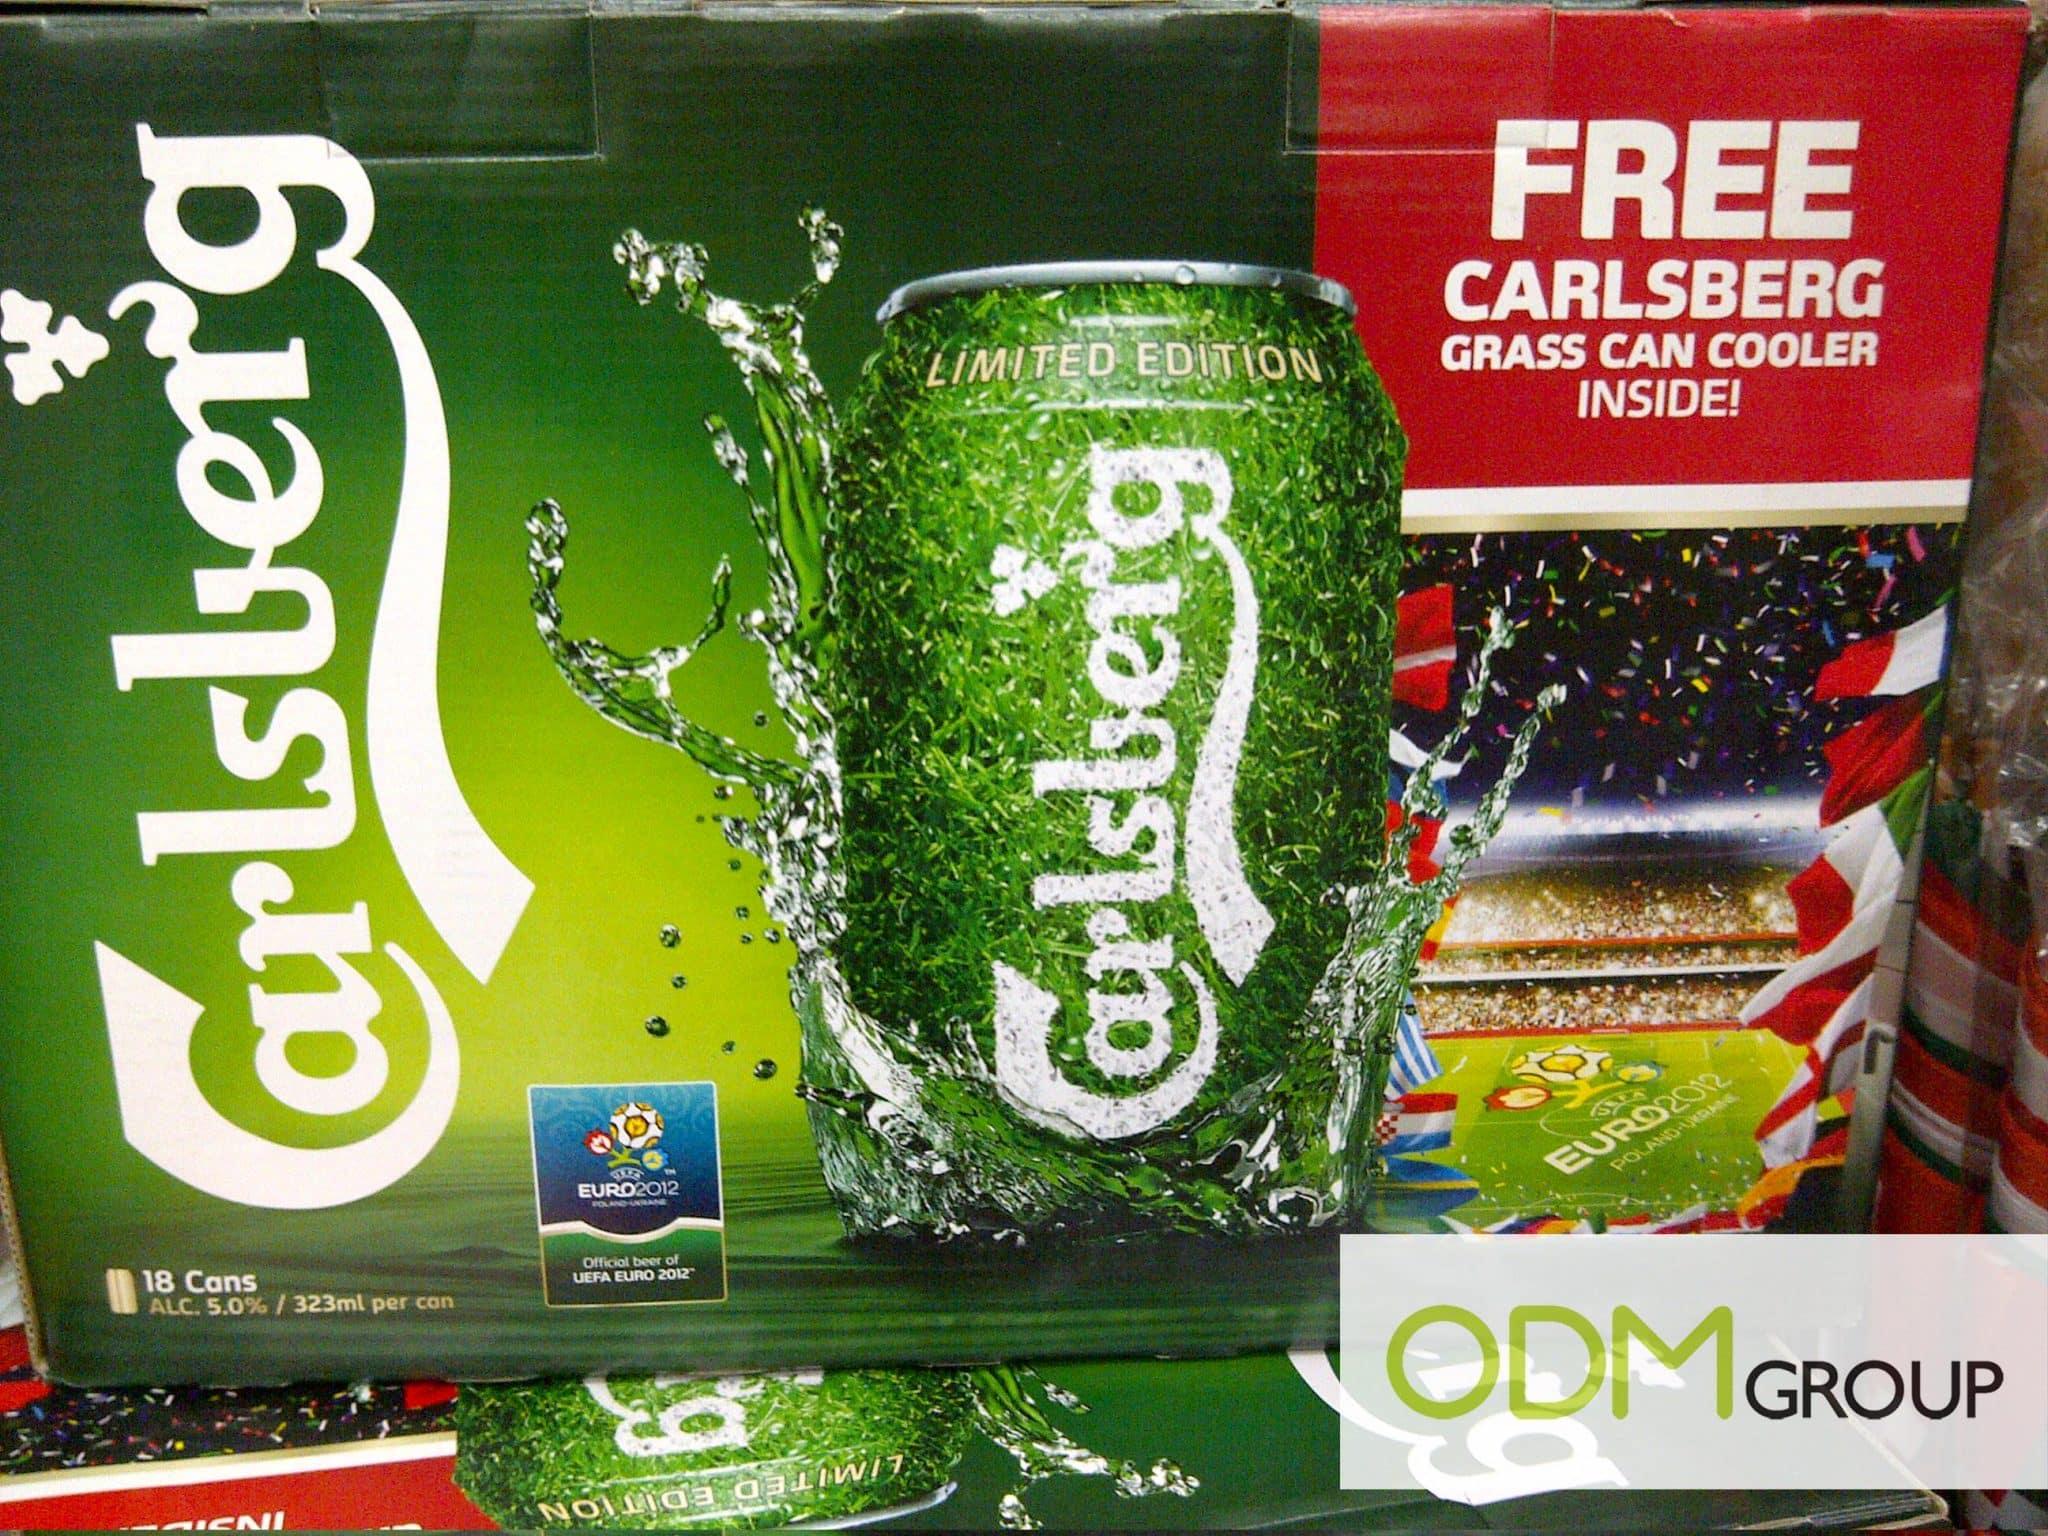 Beer Promos Carlsberg Grass Can Cooler Gwp